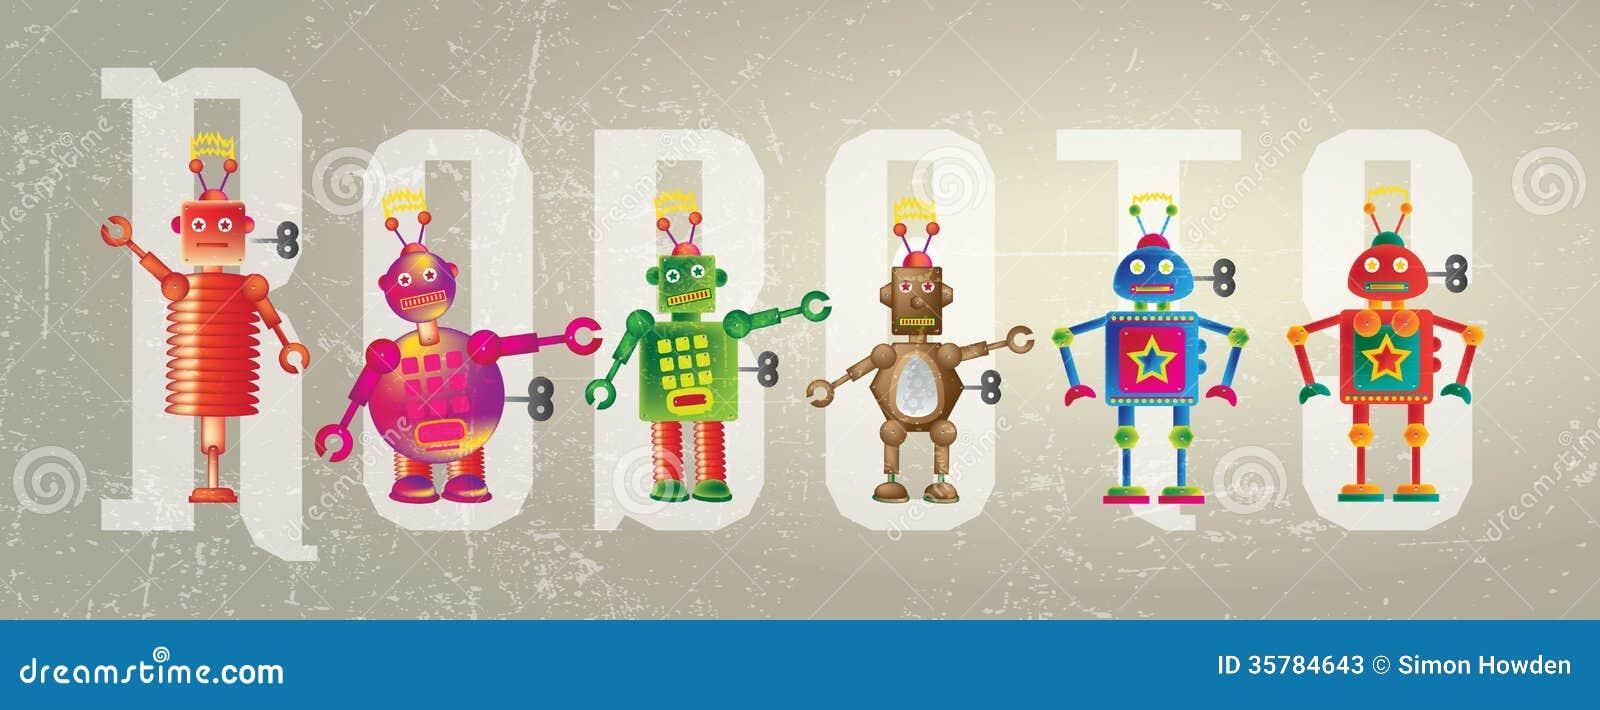 Robots Banner Illustration 35784643 Megapixl